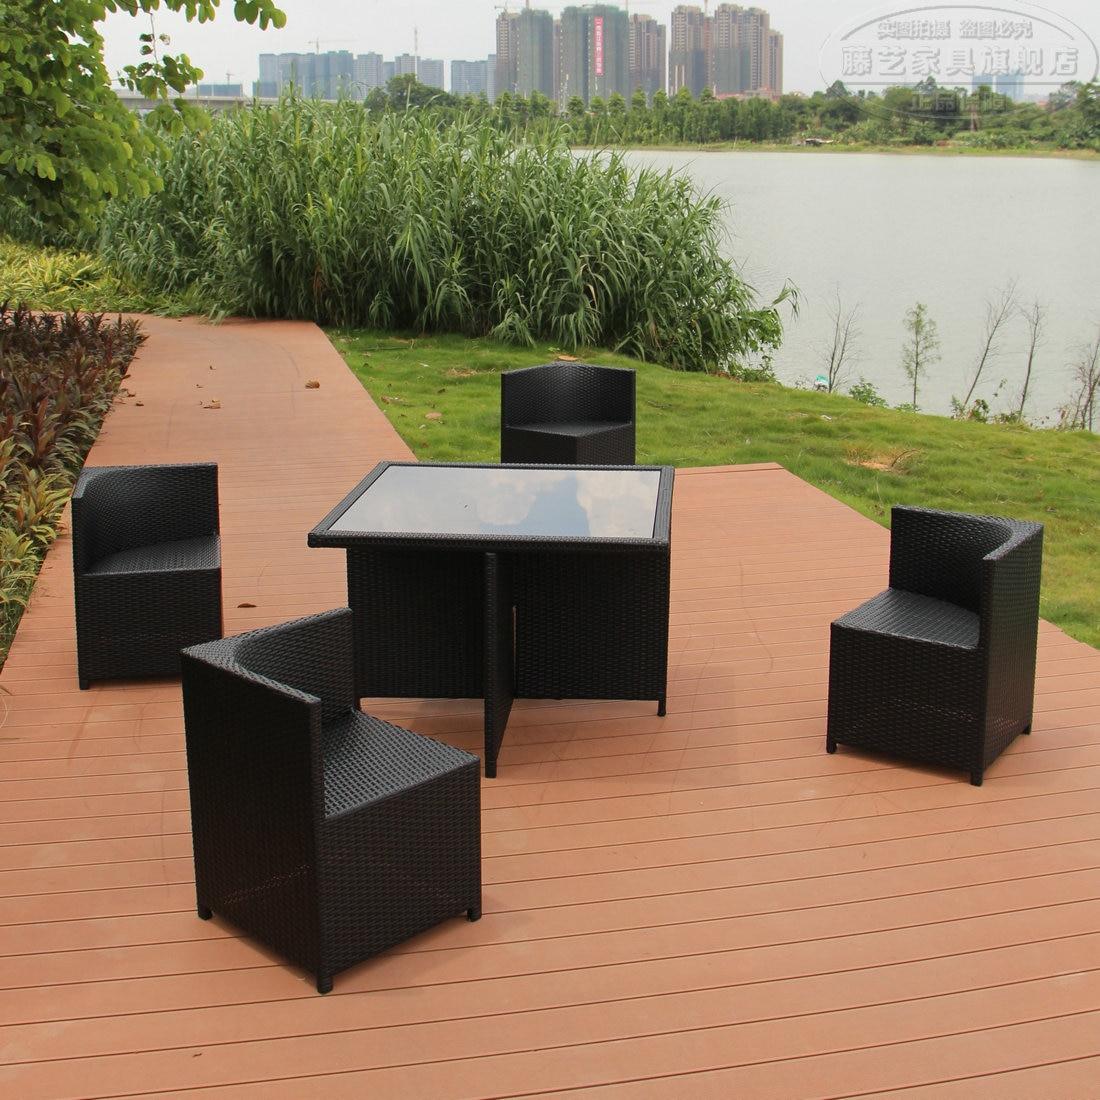 Outdoor Patio Furniture Furniture Coffee Cafe Casual Wicker Chair Outdoor  Balcony Garden Bar Counters